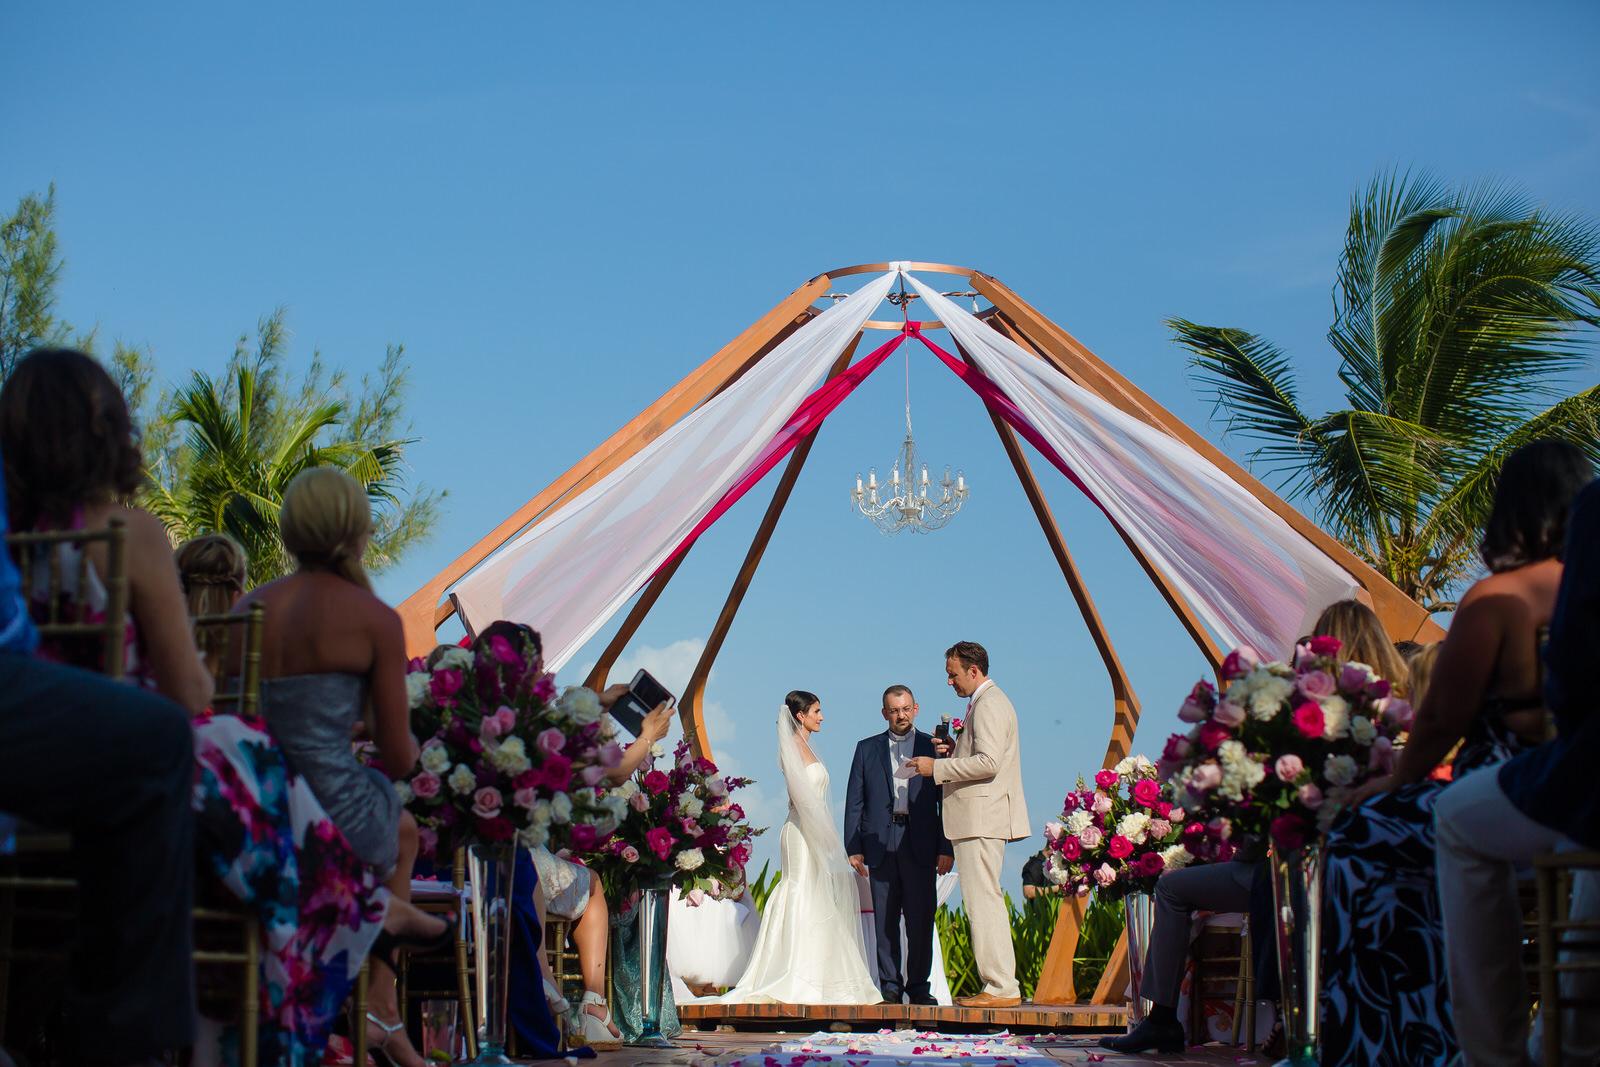 gorgeous_wedding_ceremony_destination_playa_del_carmen_mexico.jpg